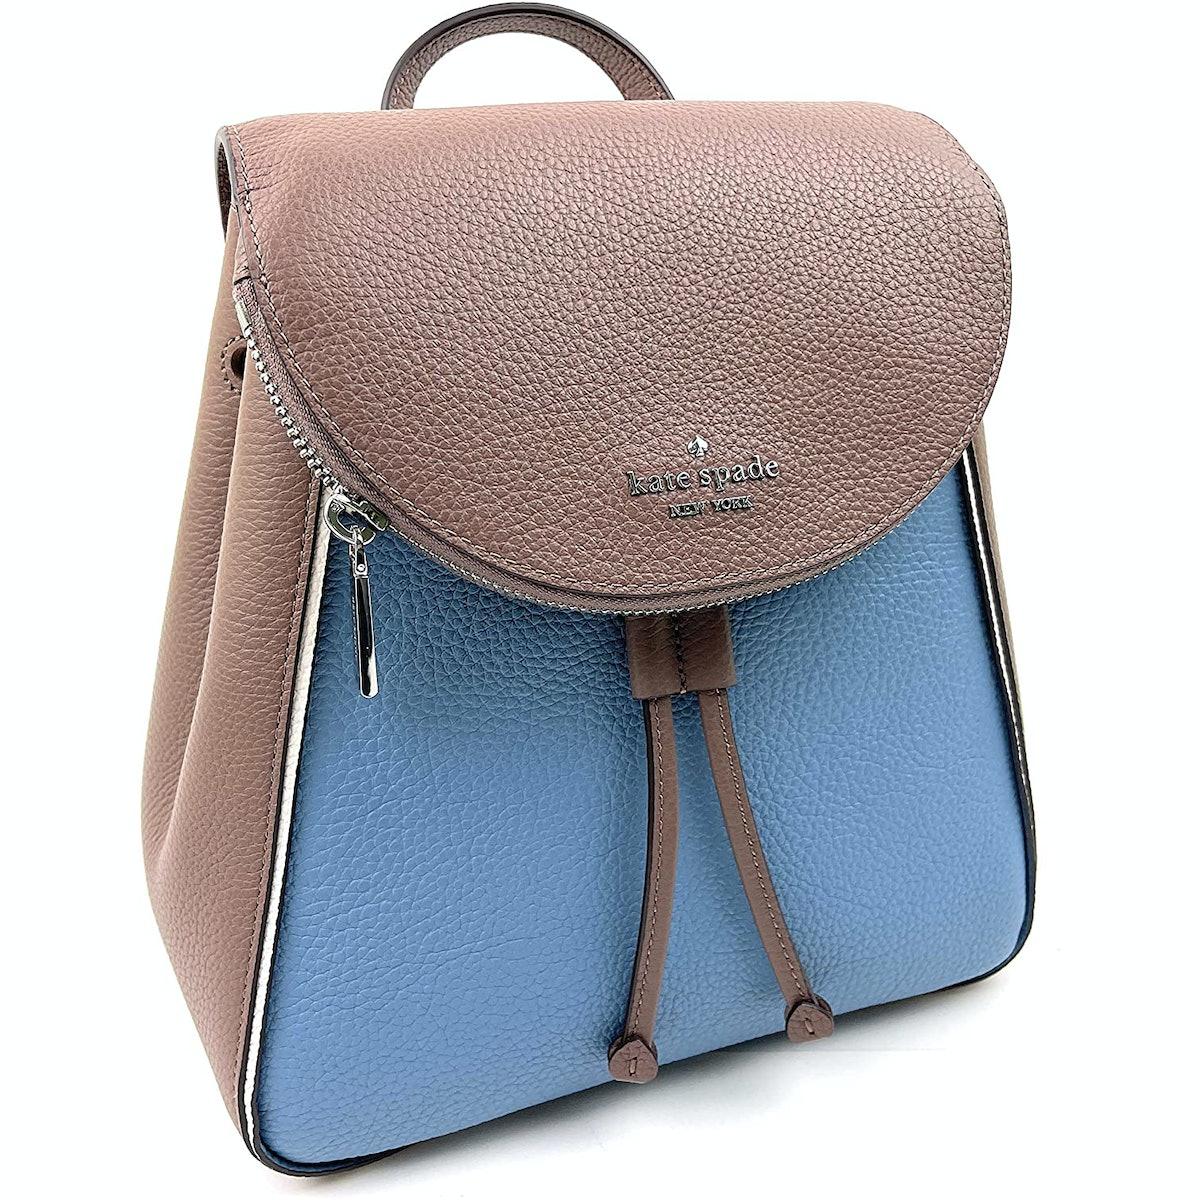 Kate Spade Leila Medium Pebbled Leather Backpack